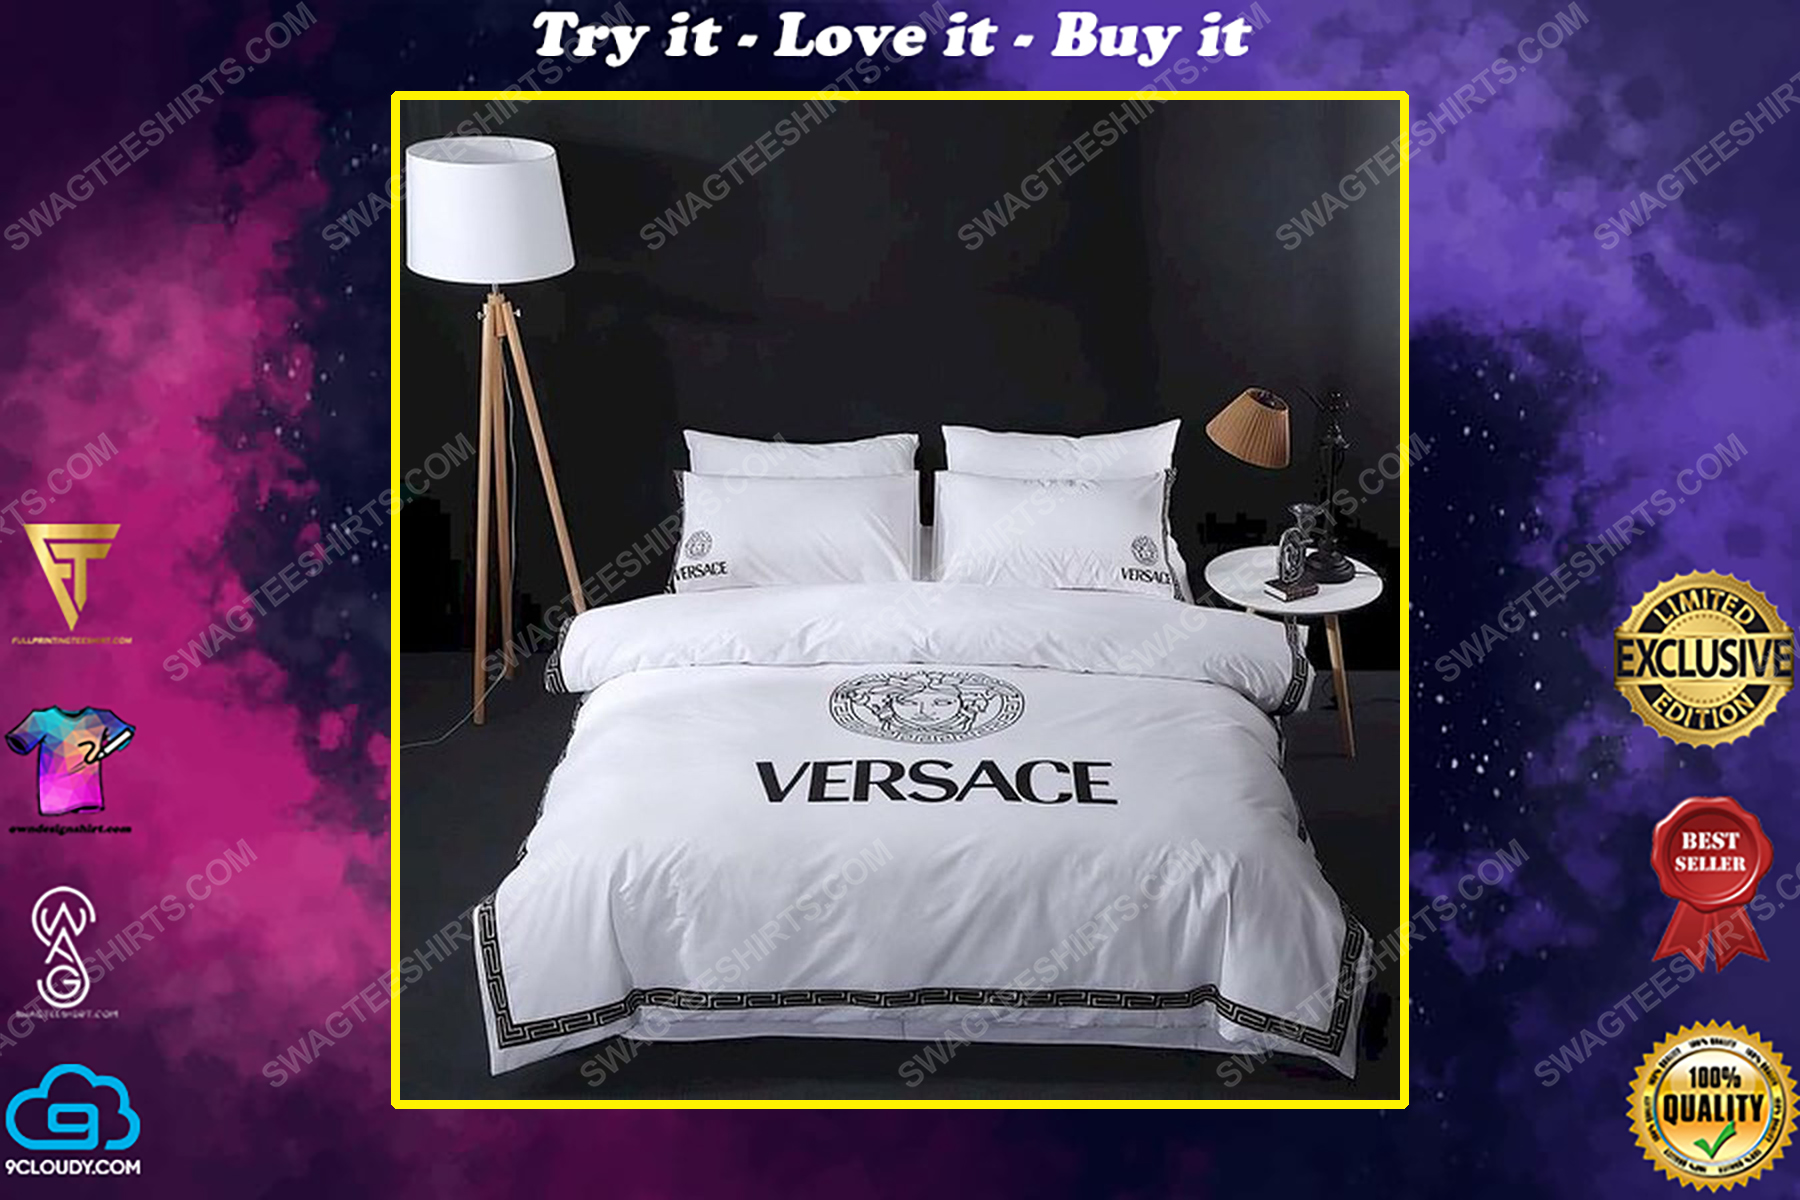 Versace home original full print duvet cover bedding set